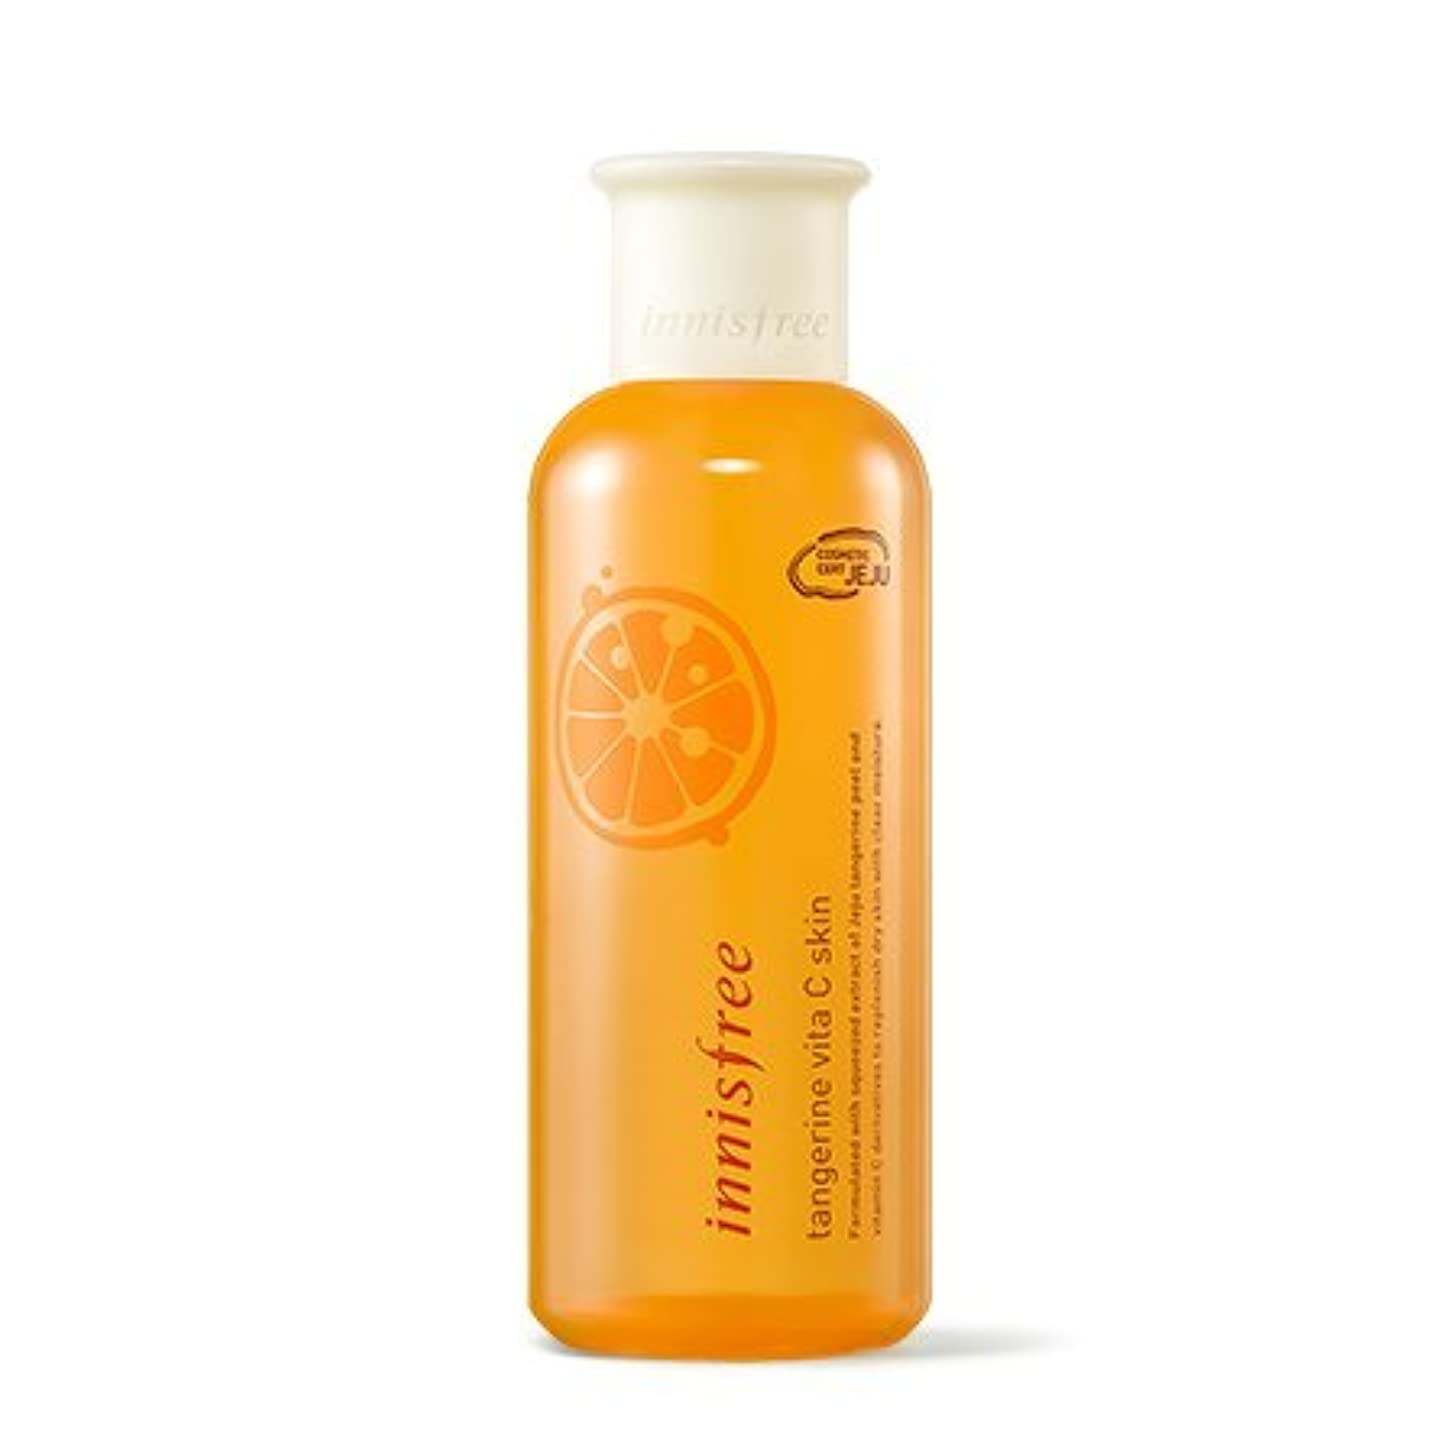 [New] innisfree Tangerine Vita C Skin 200ml/イニスフリー タンジェリン ビタ C スキン 200ml [並行輸入品]